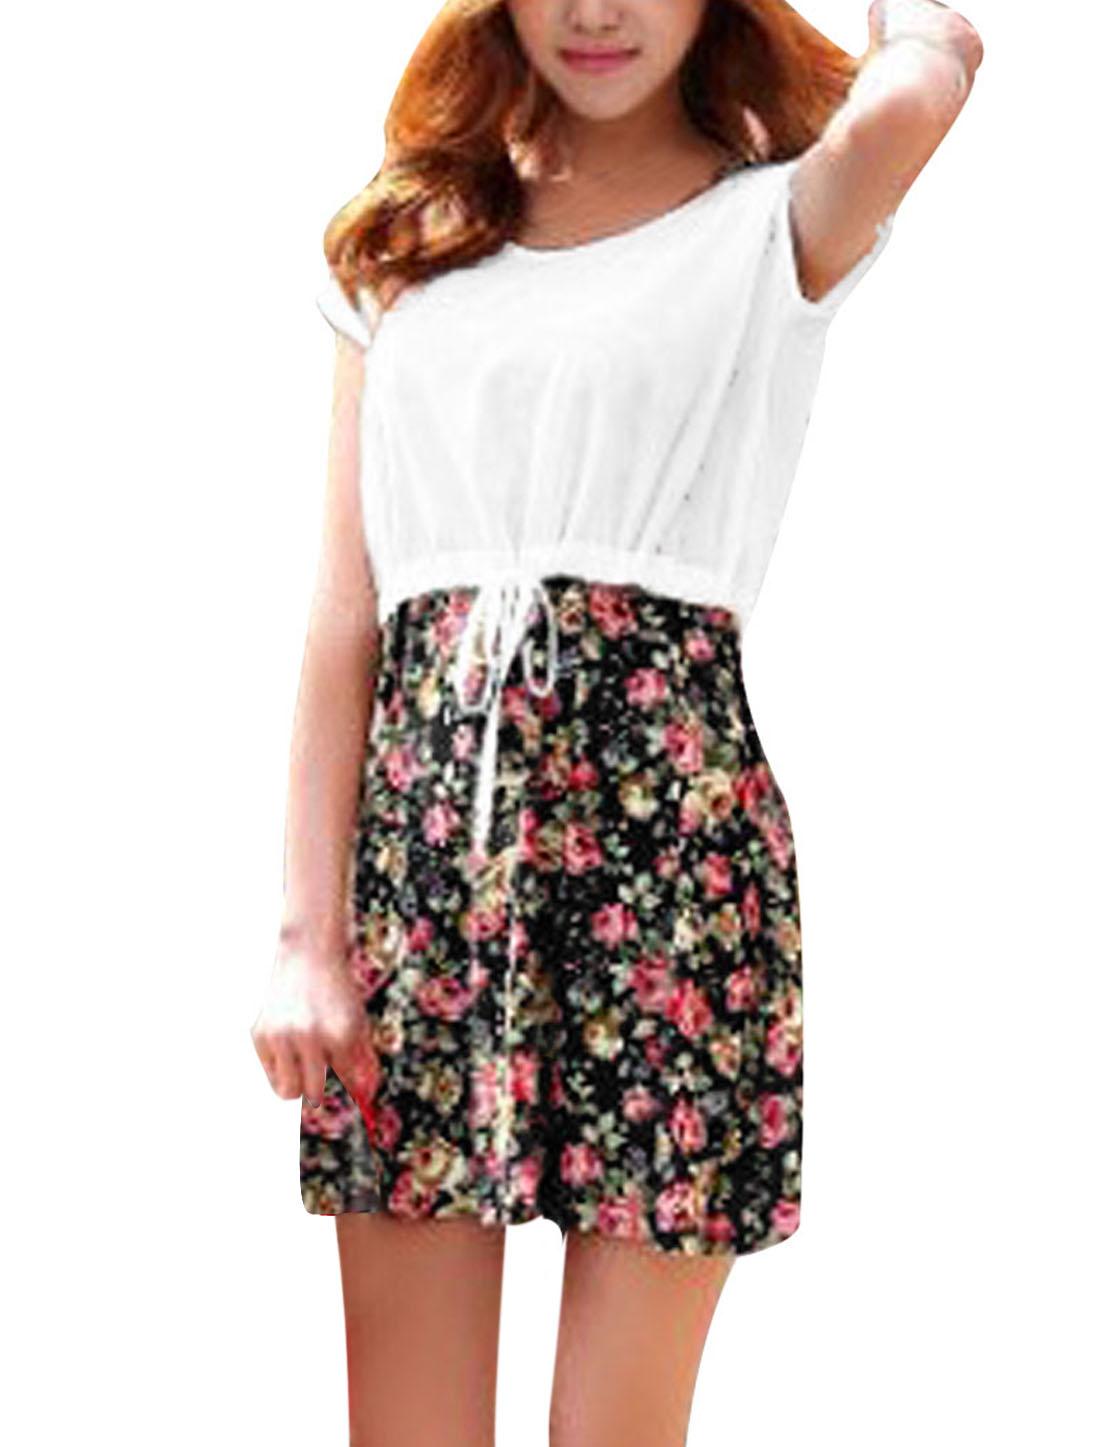 Ladies See Through Drawstring Top w Sleeveless Floral Print Dress F Black